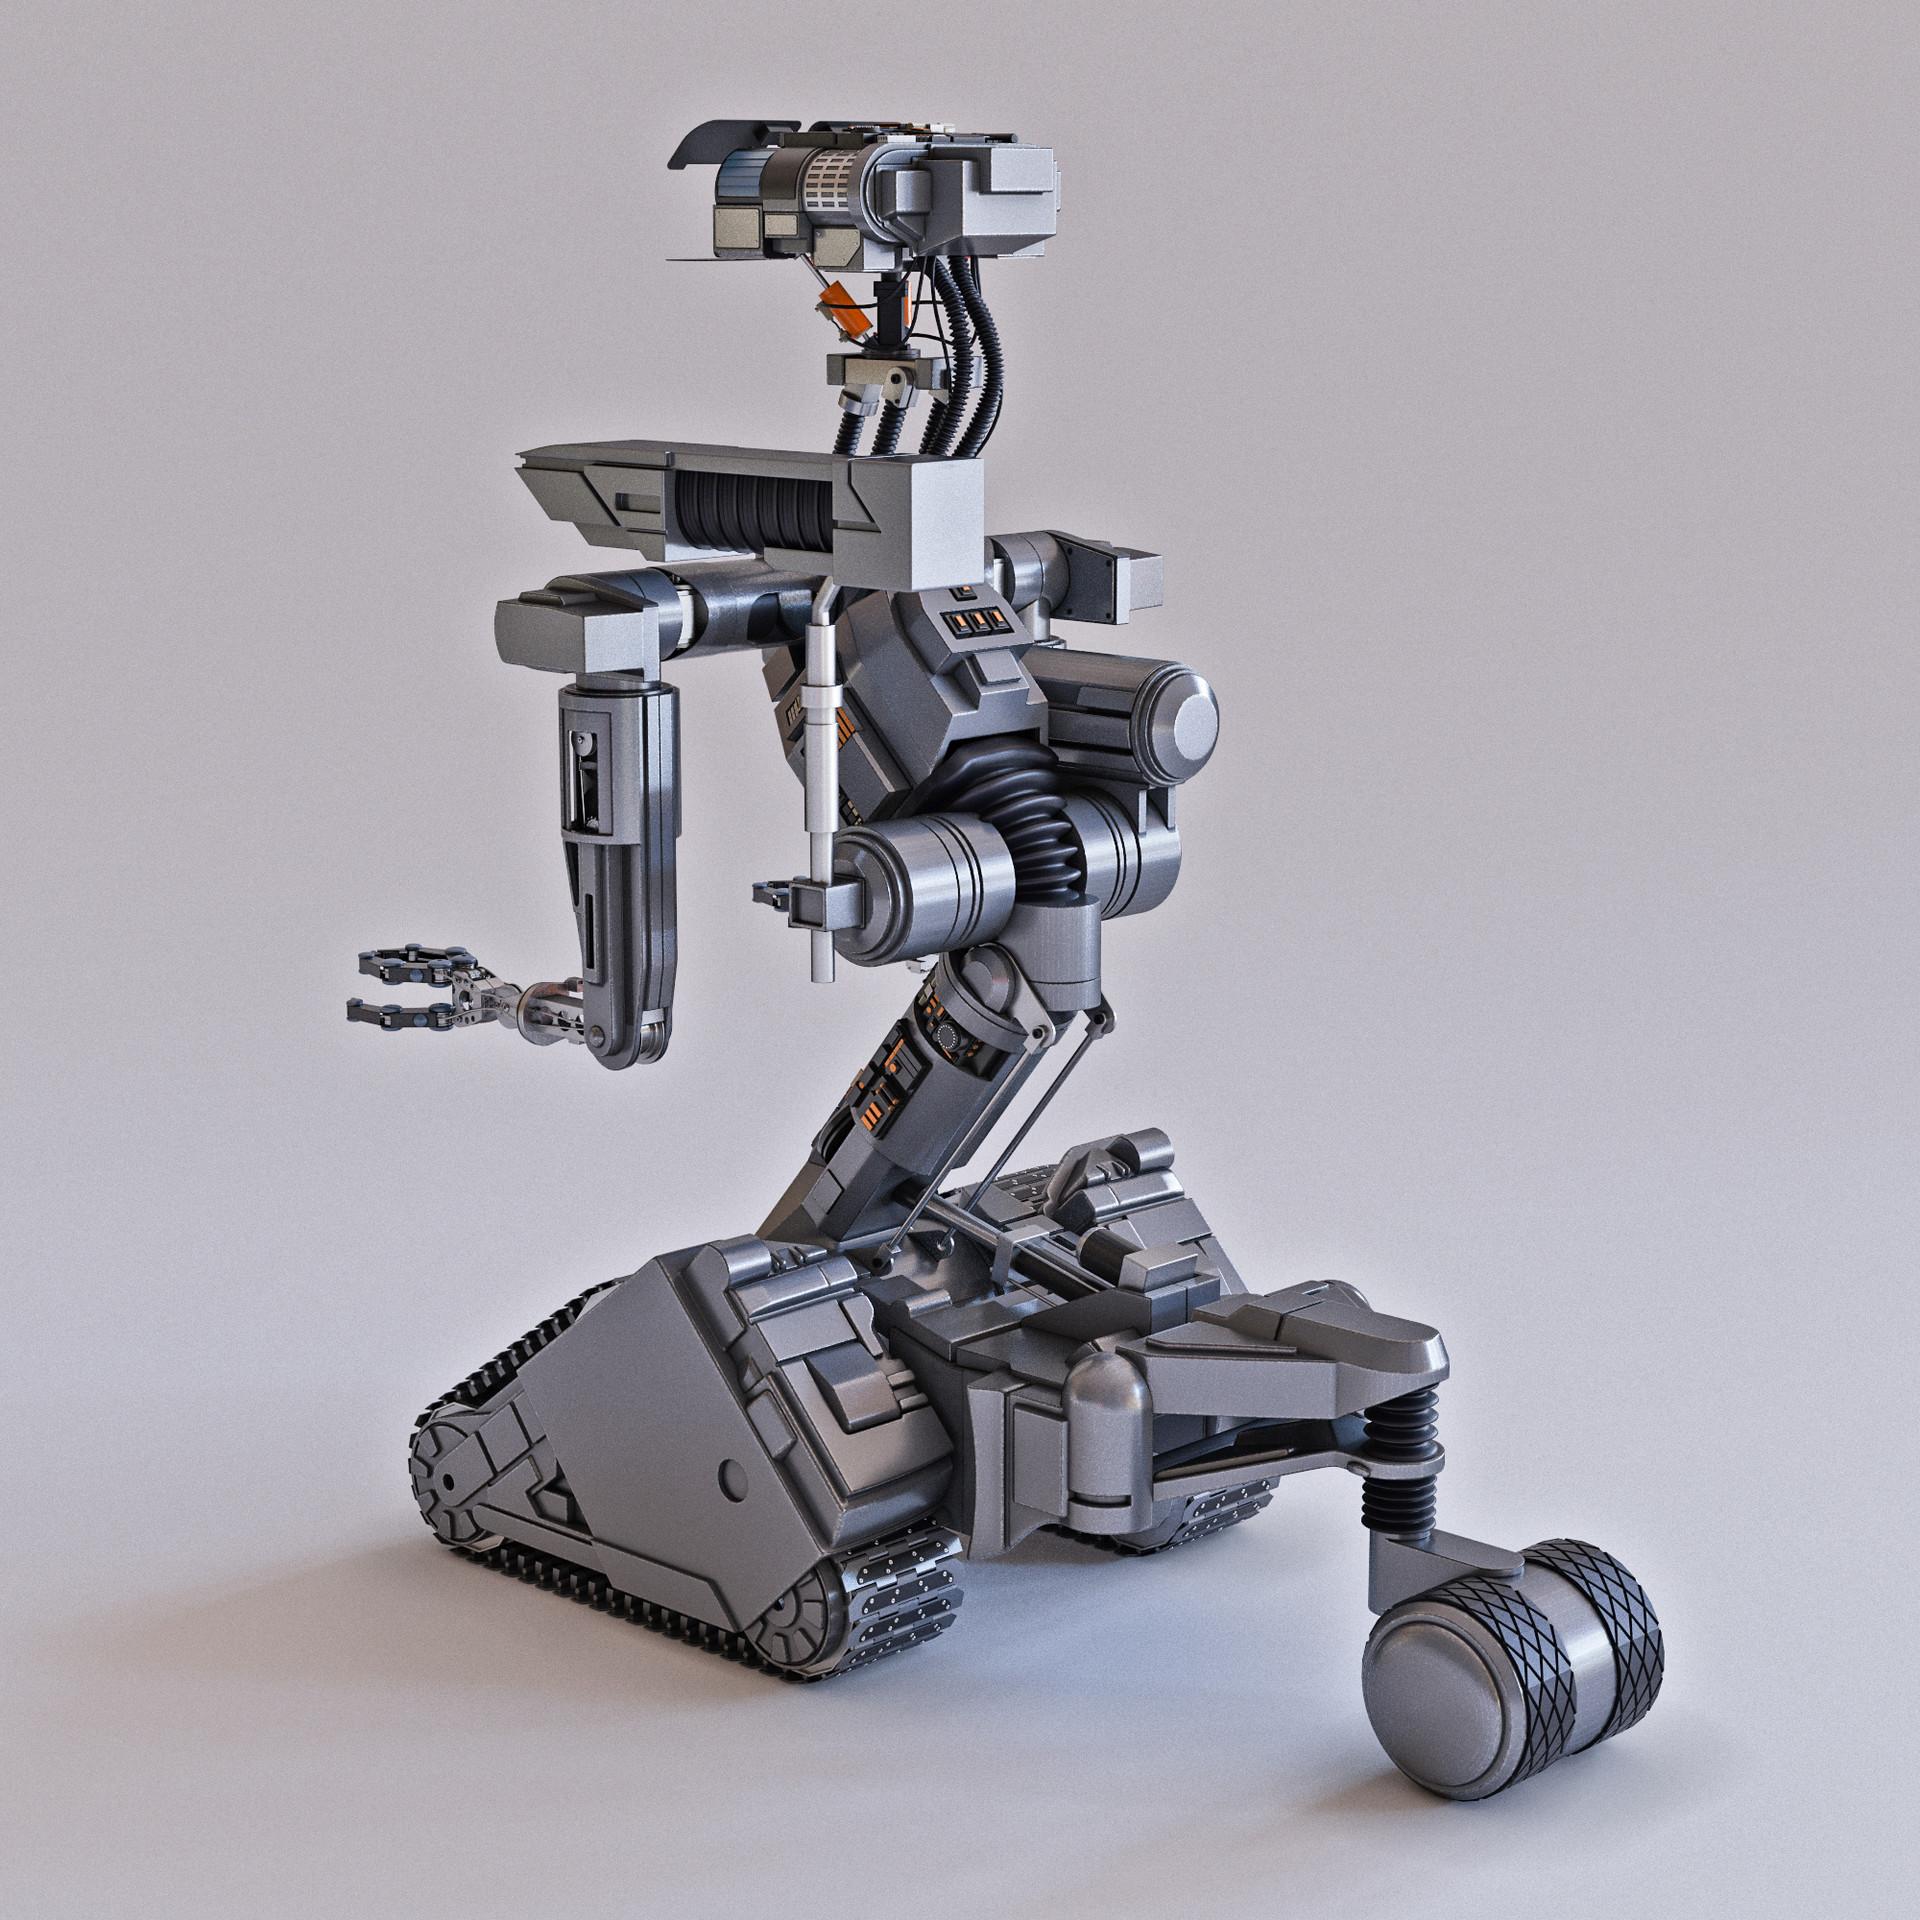 Johnny 5 Robot Magazine Wiring Diagrams Short Circuit Robots Artstation Alexander Demyanov Rh Com